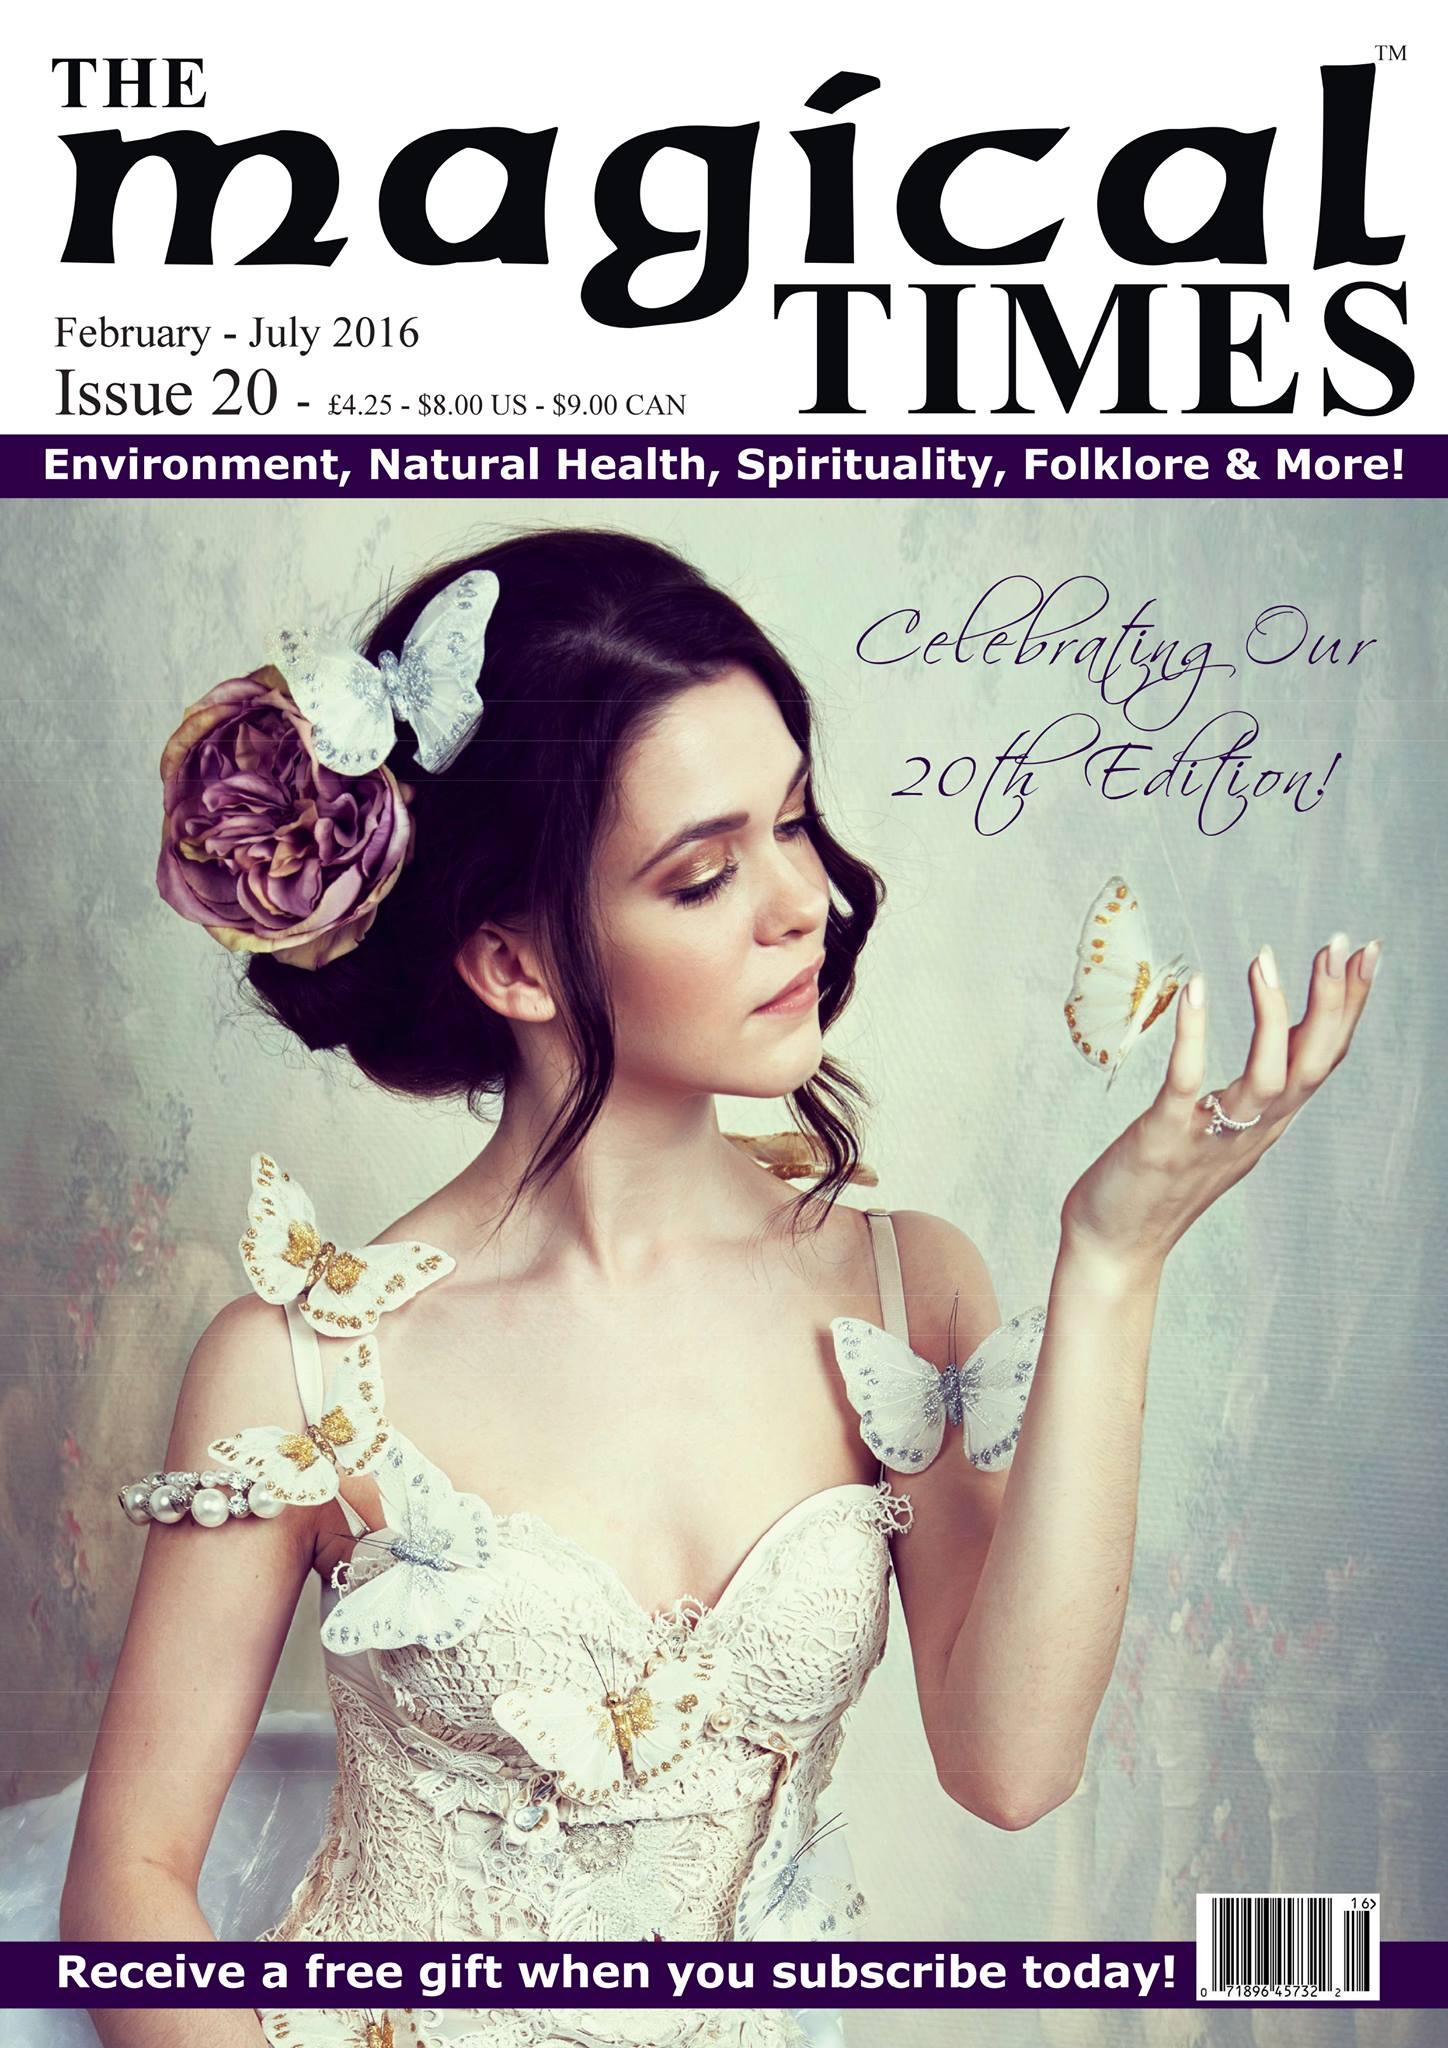 grace-almera-themagicaltimes-magazine-published-cover-photo-fine-art.jpg